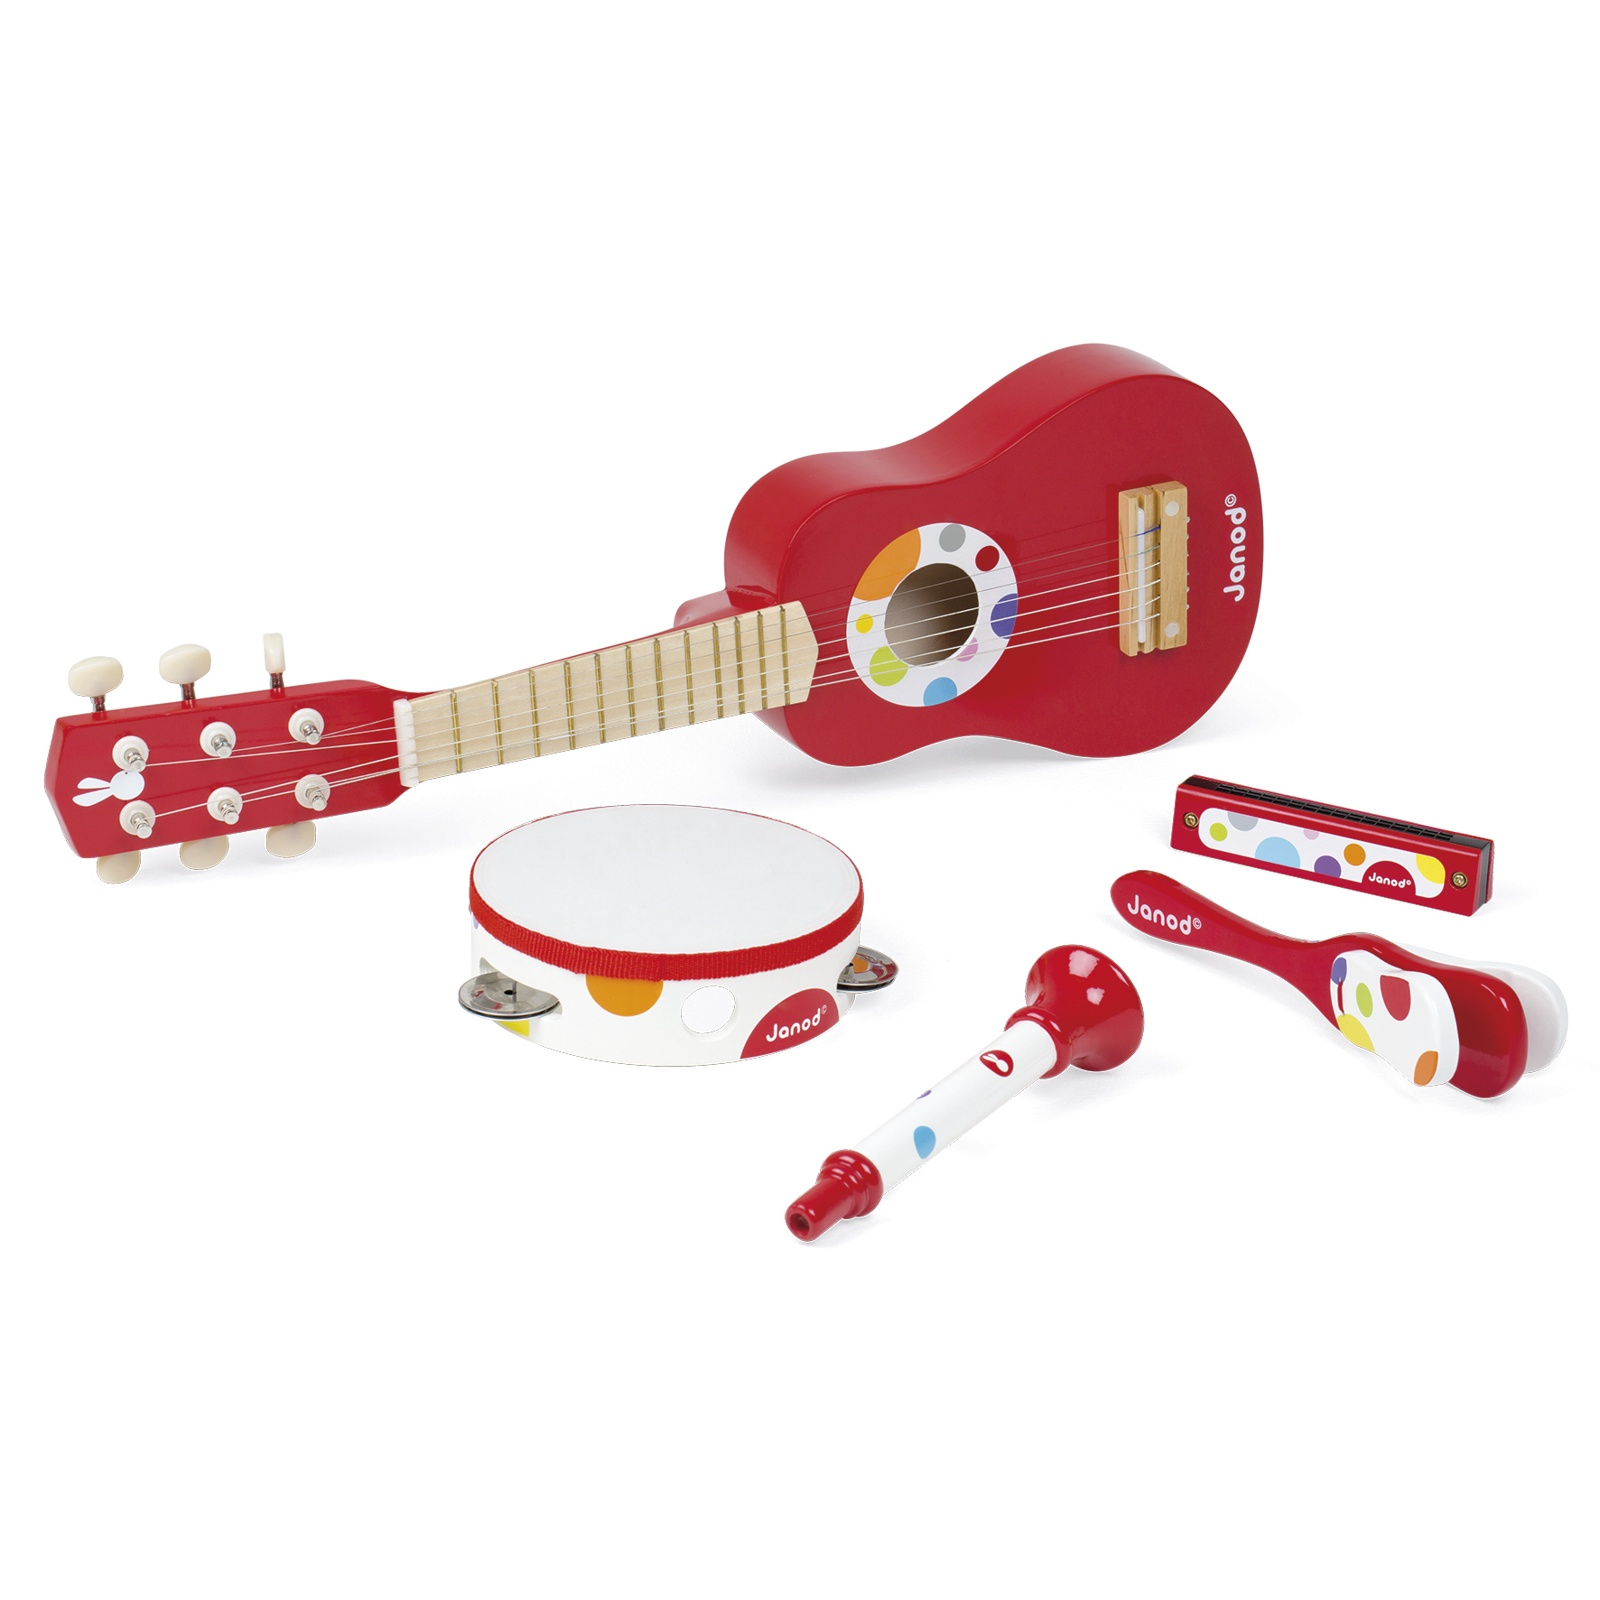 Комплект детски музикални инструменти Конфети от Janod- китара,кречетало, дайре, хармоника и тромпет(2)-bellamiestore